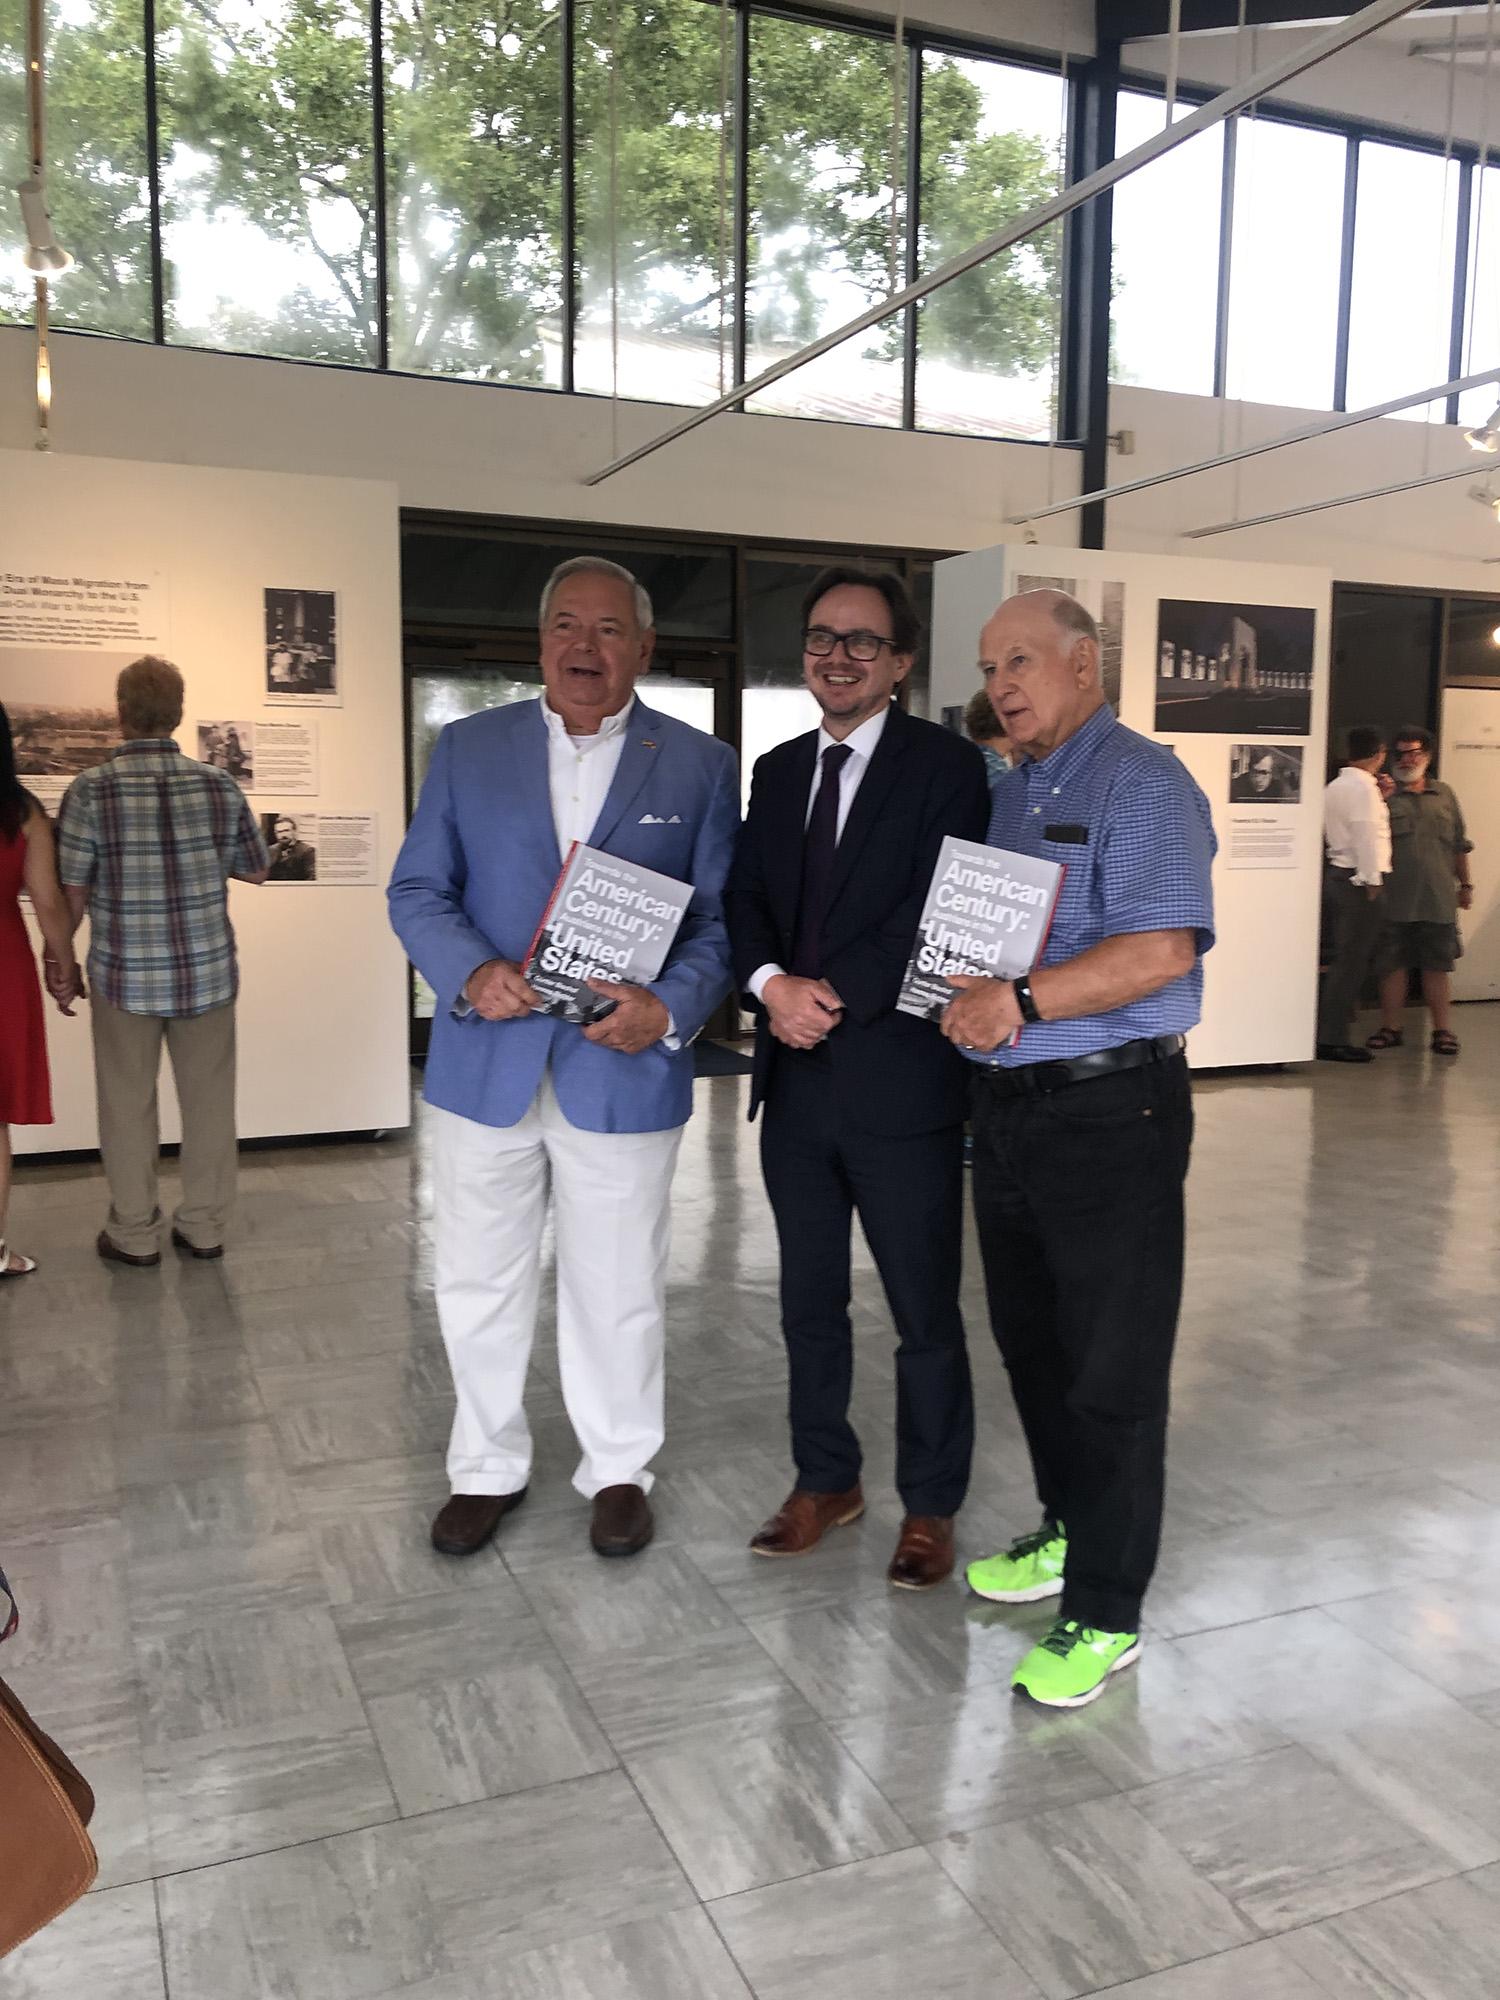 From left: Consul Philipp Lorio III, Hannes Richter, Professor Charles D. Hadley.